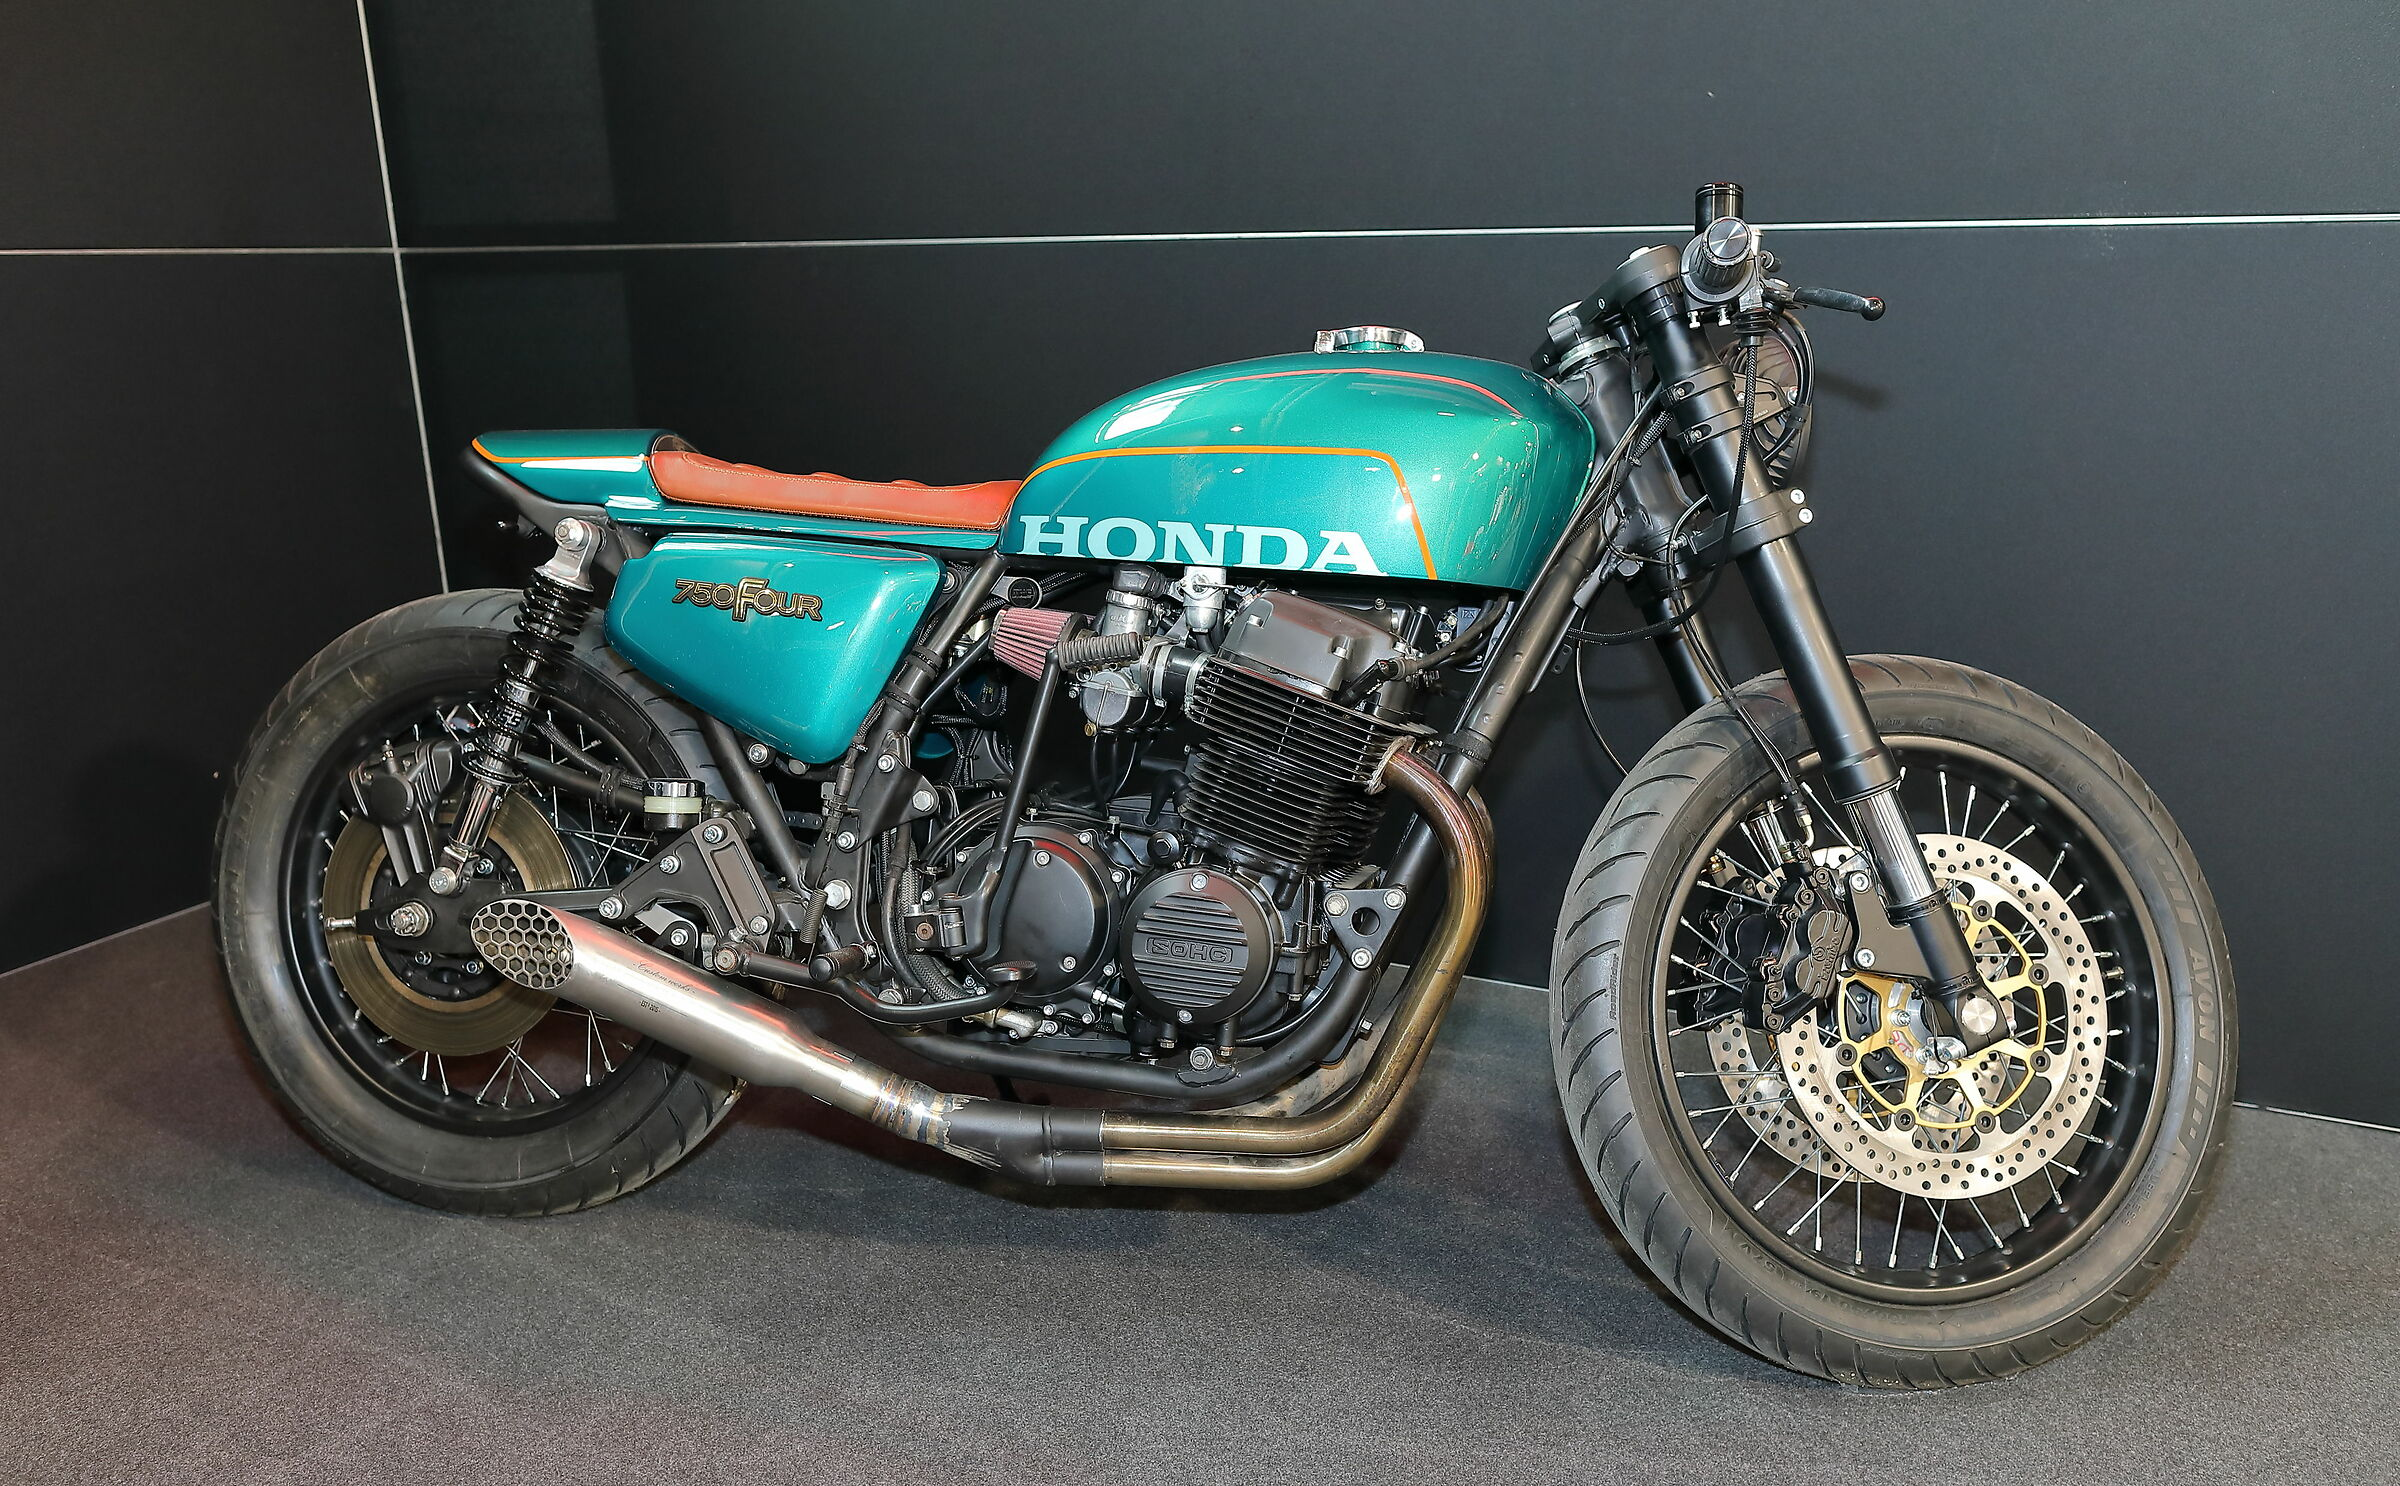 Verona - 16/01/2020 - Motor Bike Expo...